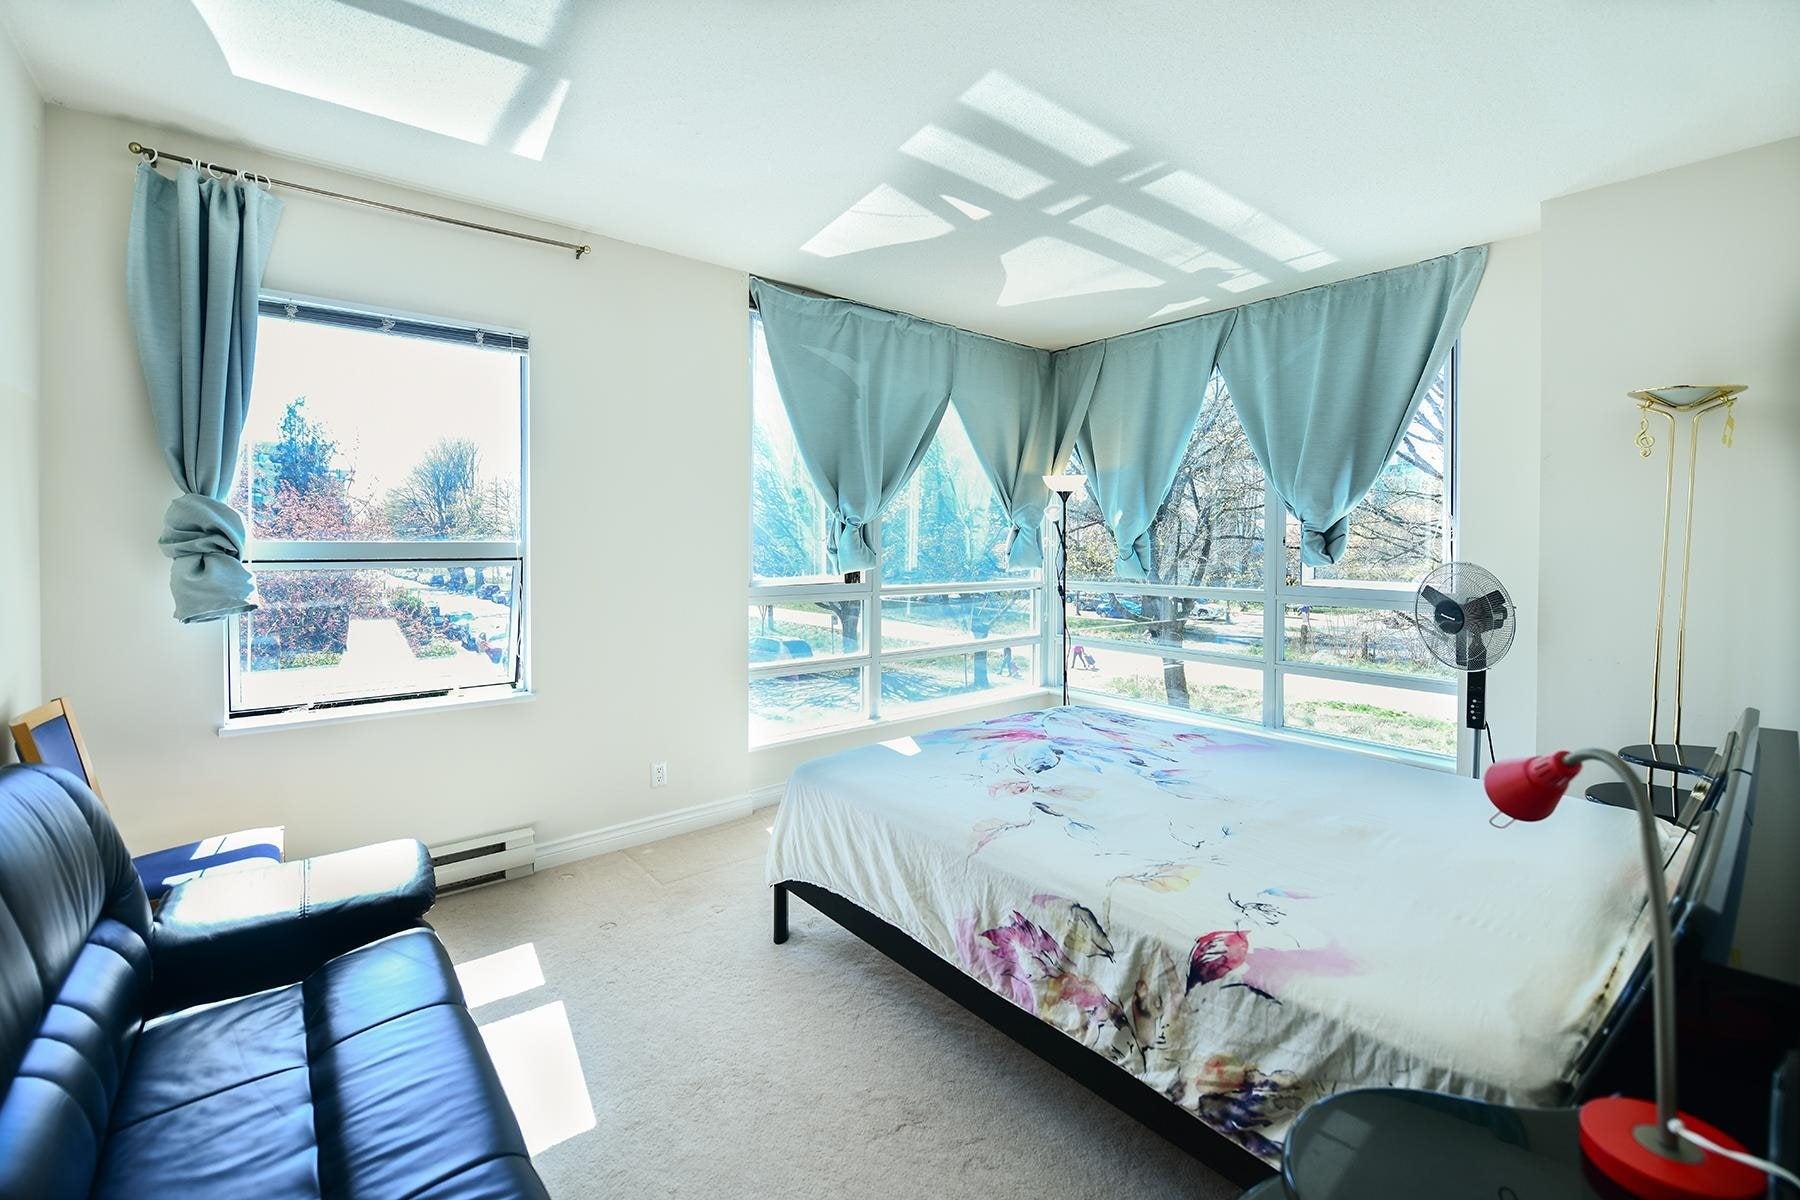 204 5790 EAST BOULEVARD - Kerrisdale Apartment/Condo for sale, 3 Bedrooms (R2604138) - #14